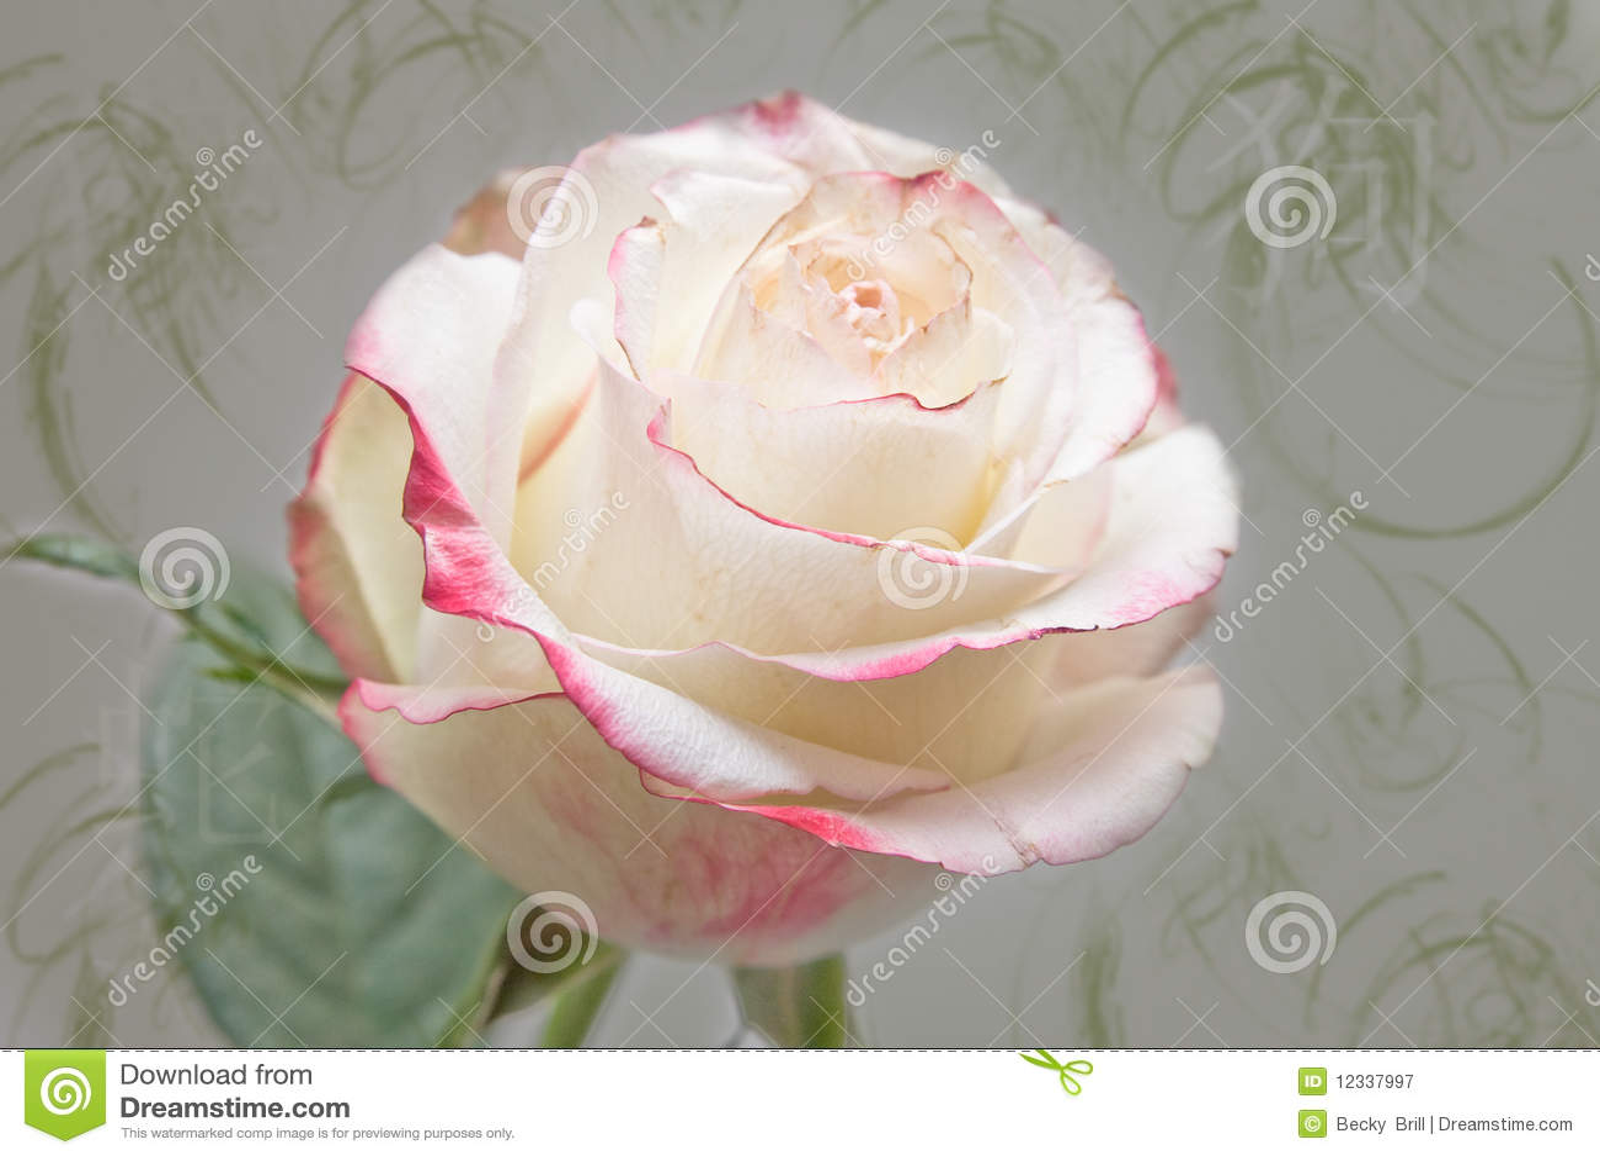 Rose Royalty Free Stock Photography Image 12337997